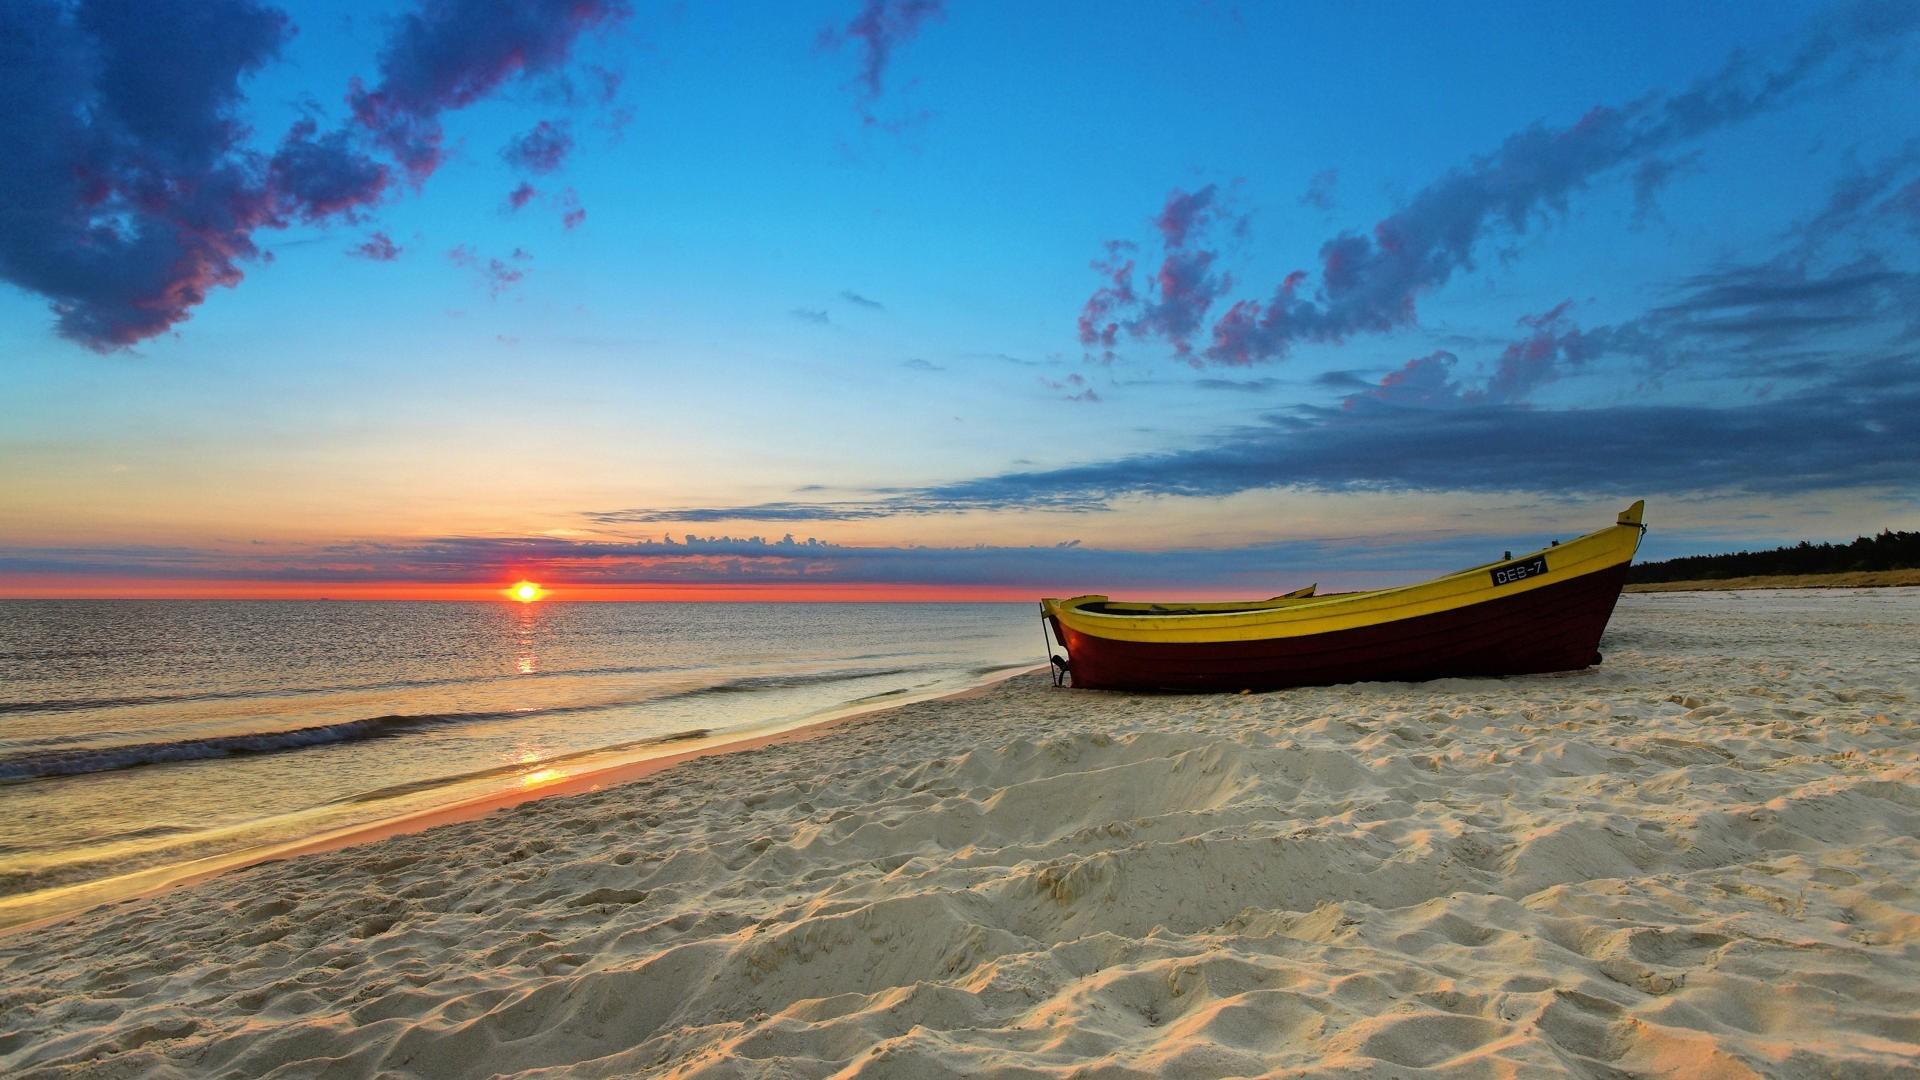 Wallpaper boat, decline, evening, romanticism, sand, beach,  horizon